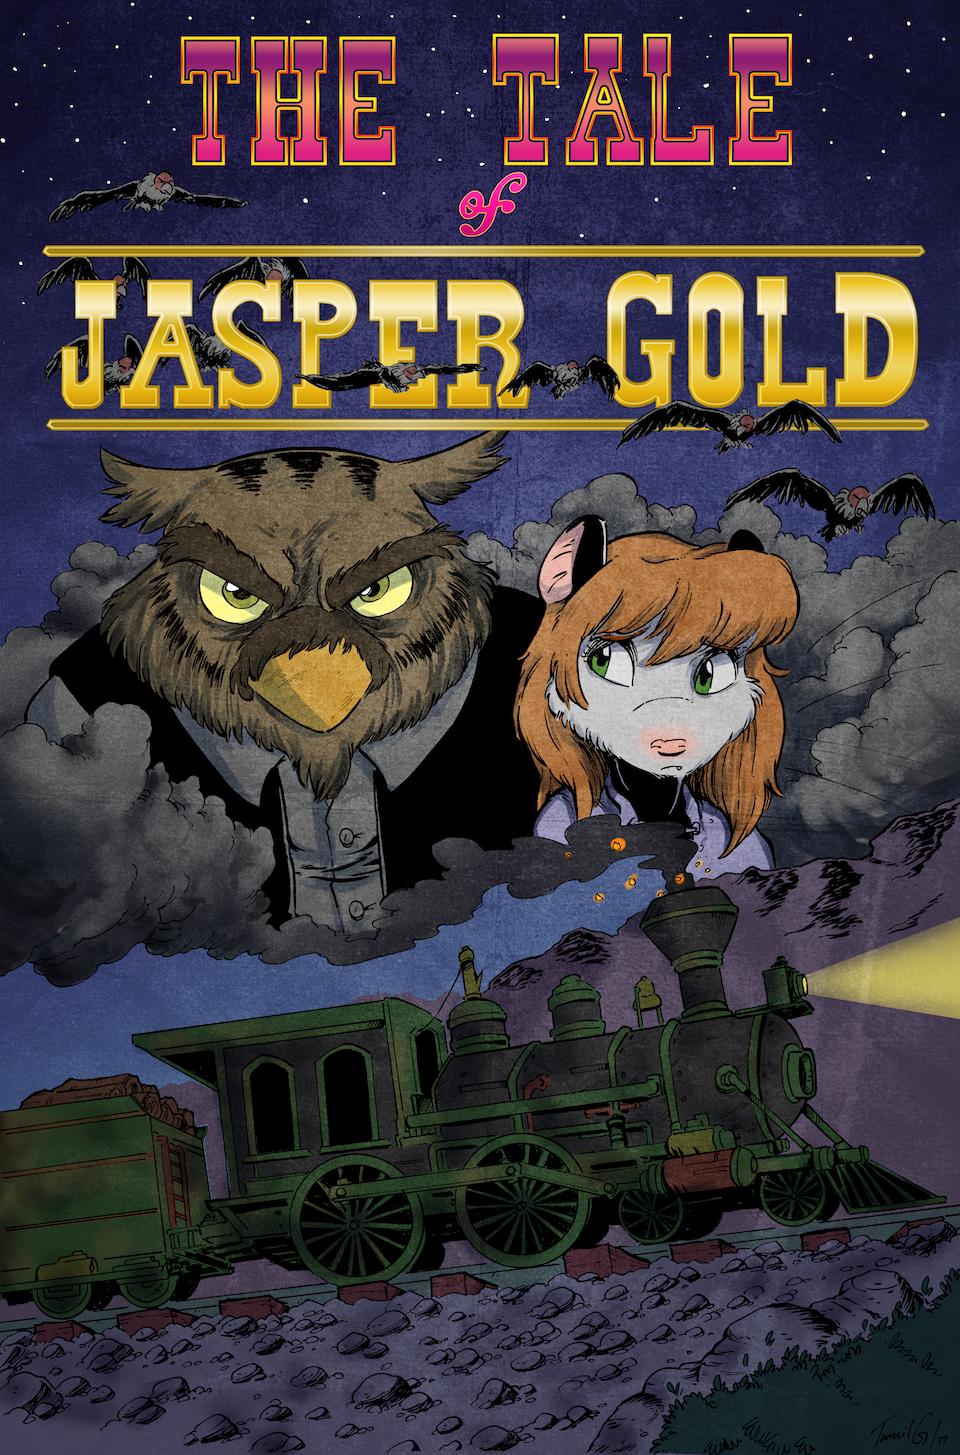 Jasper Gold 04 – Cover